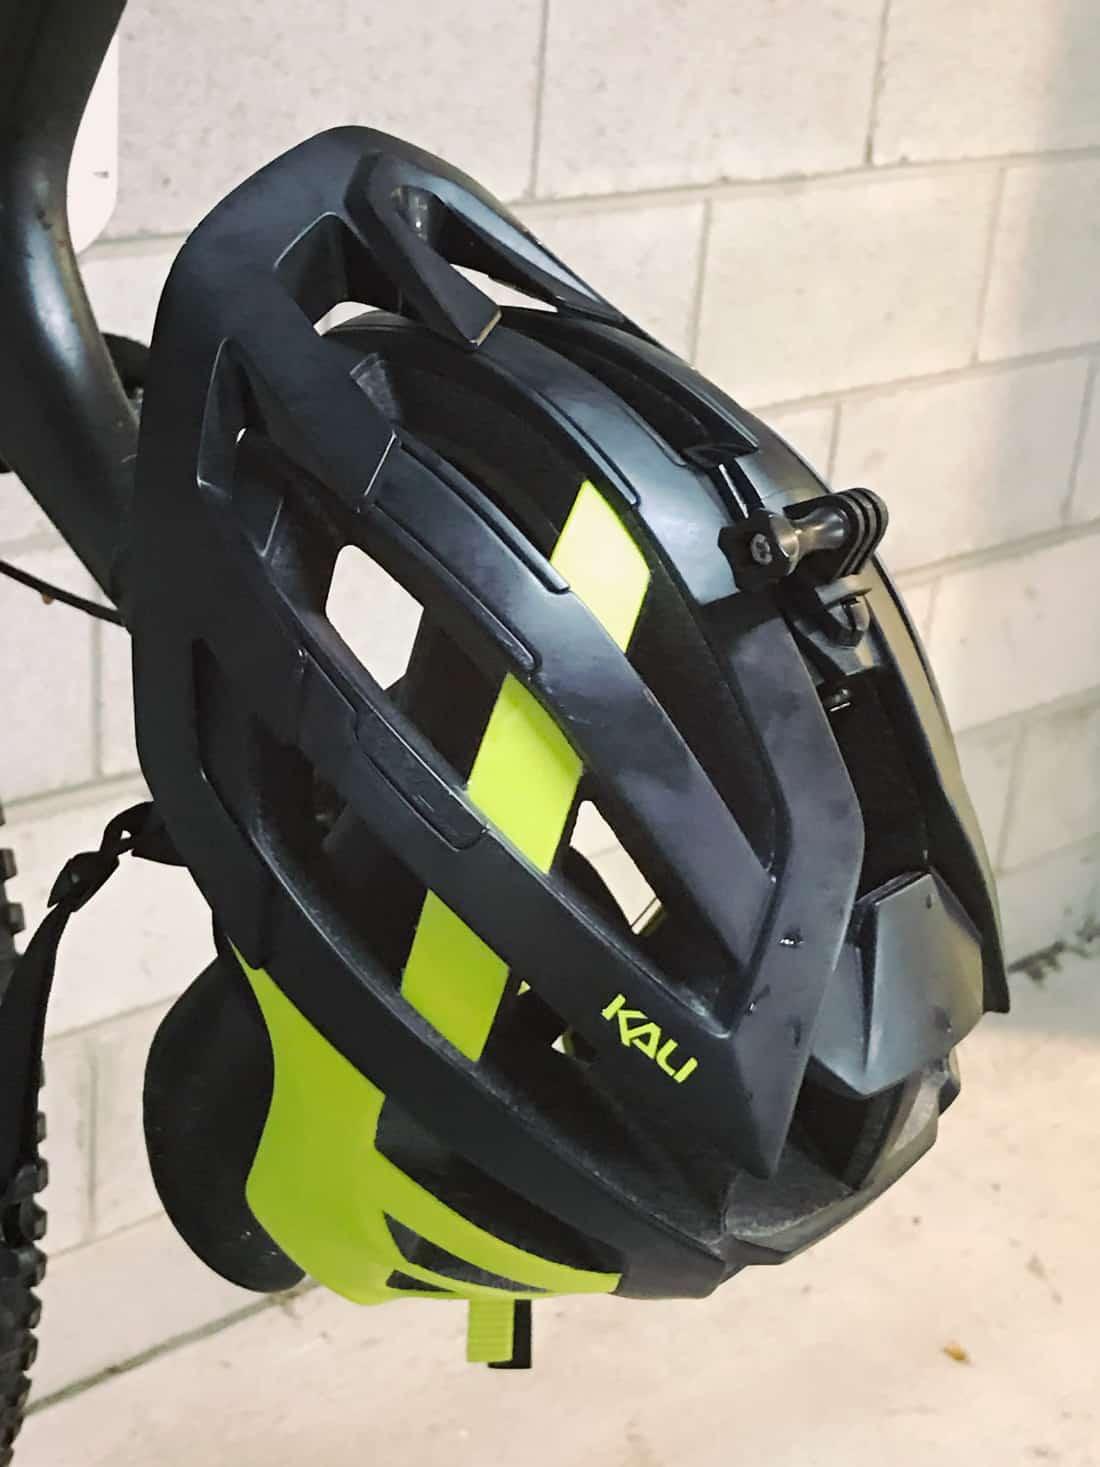 TESTED: Kali Protectives Interceptor Helmet